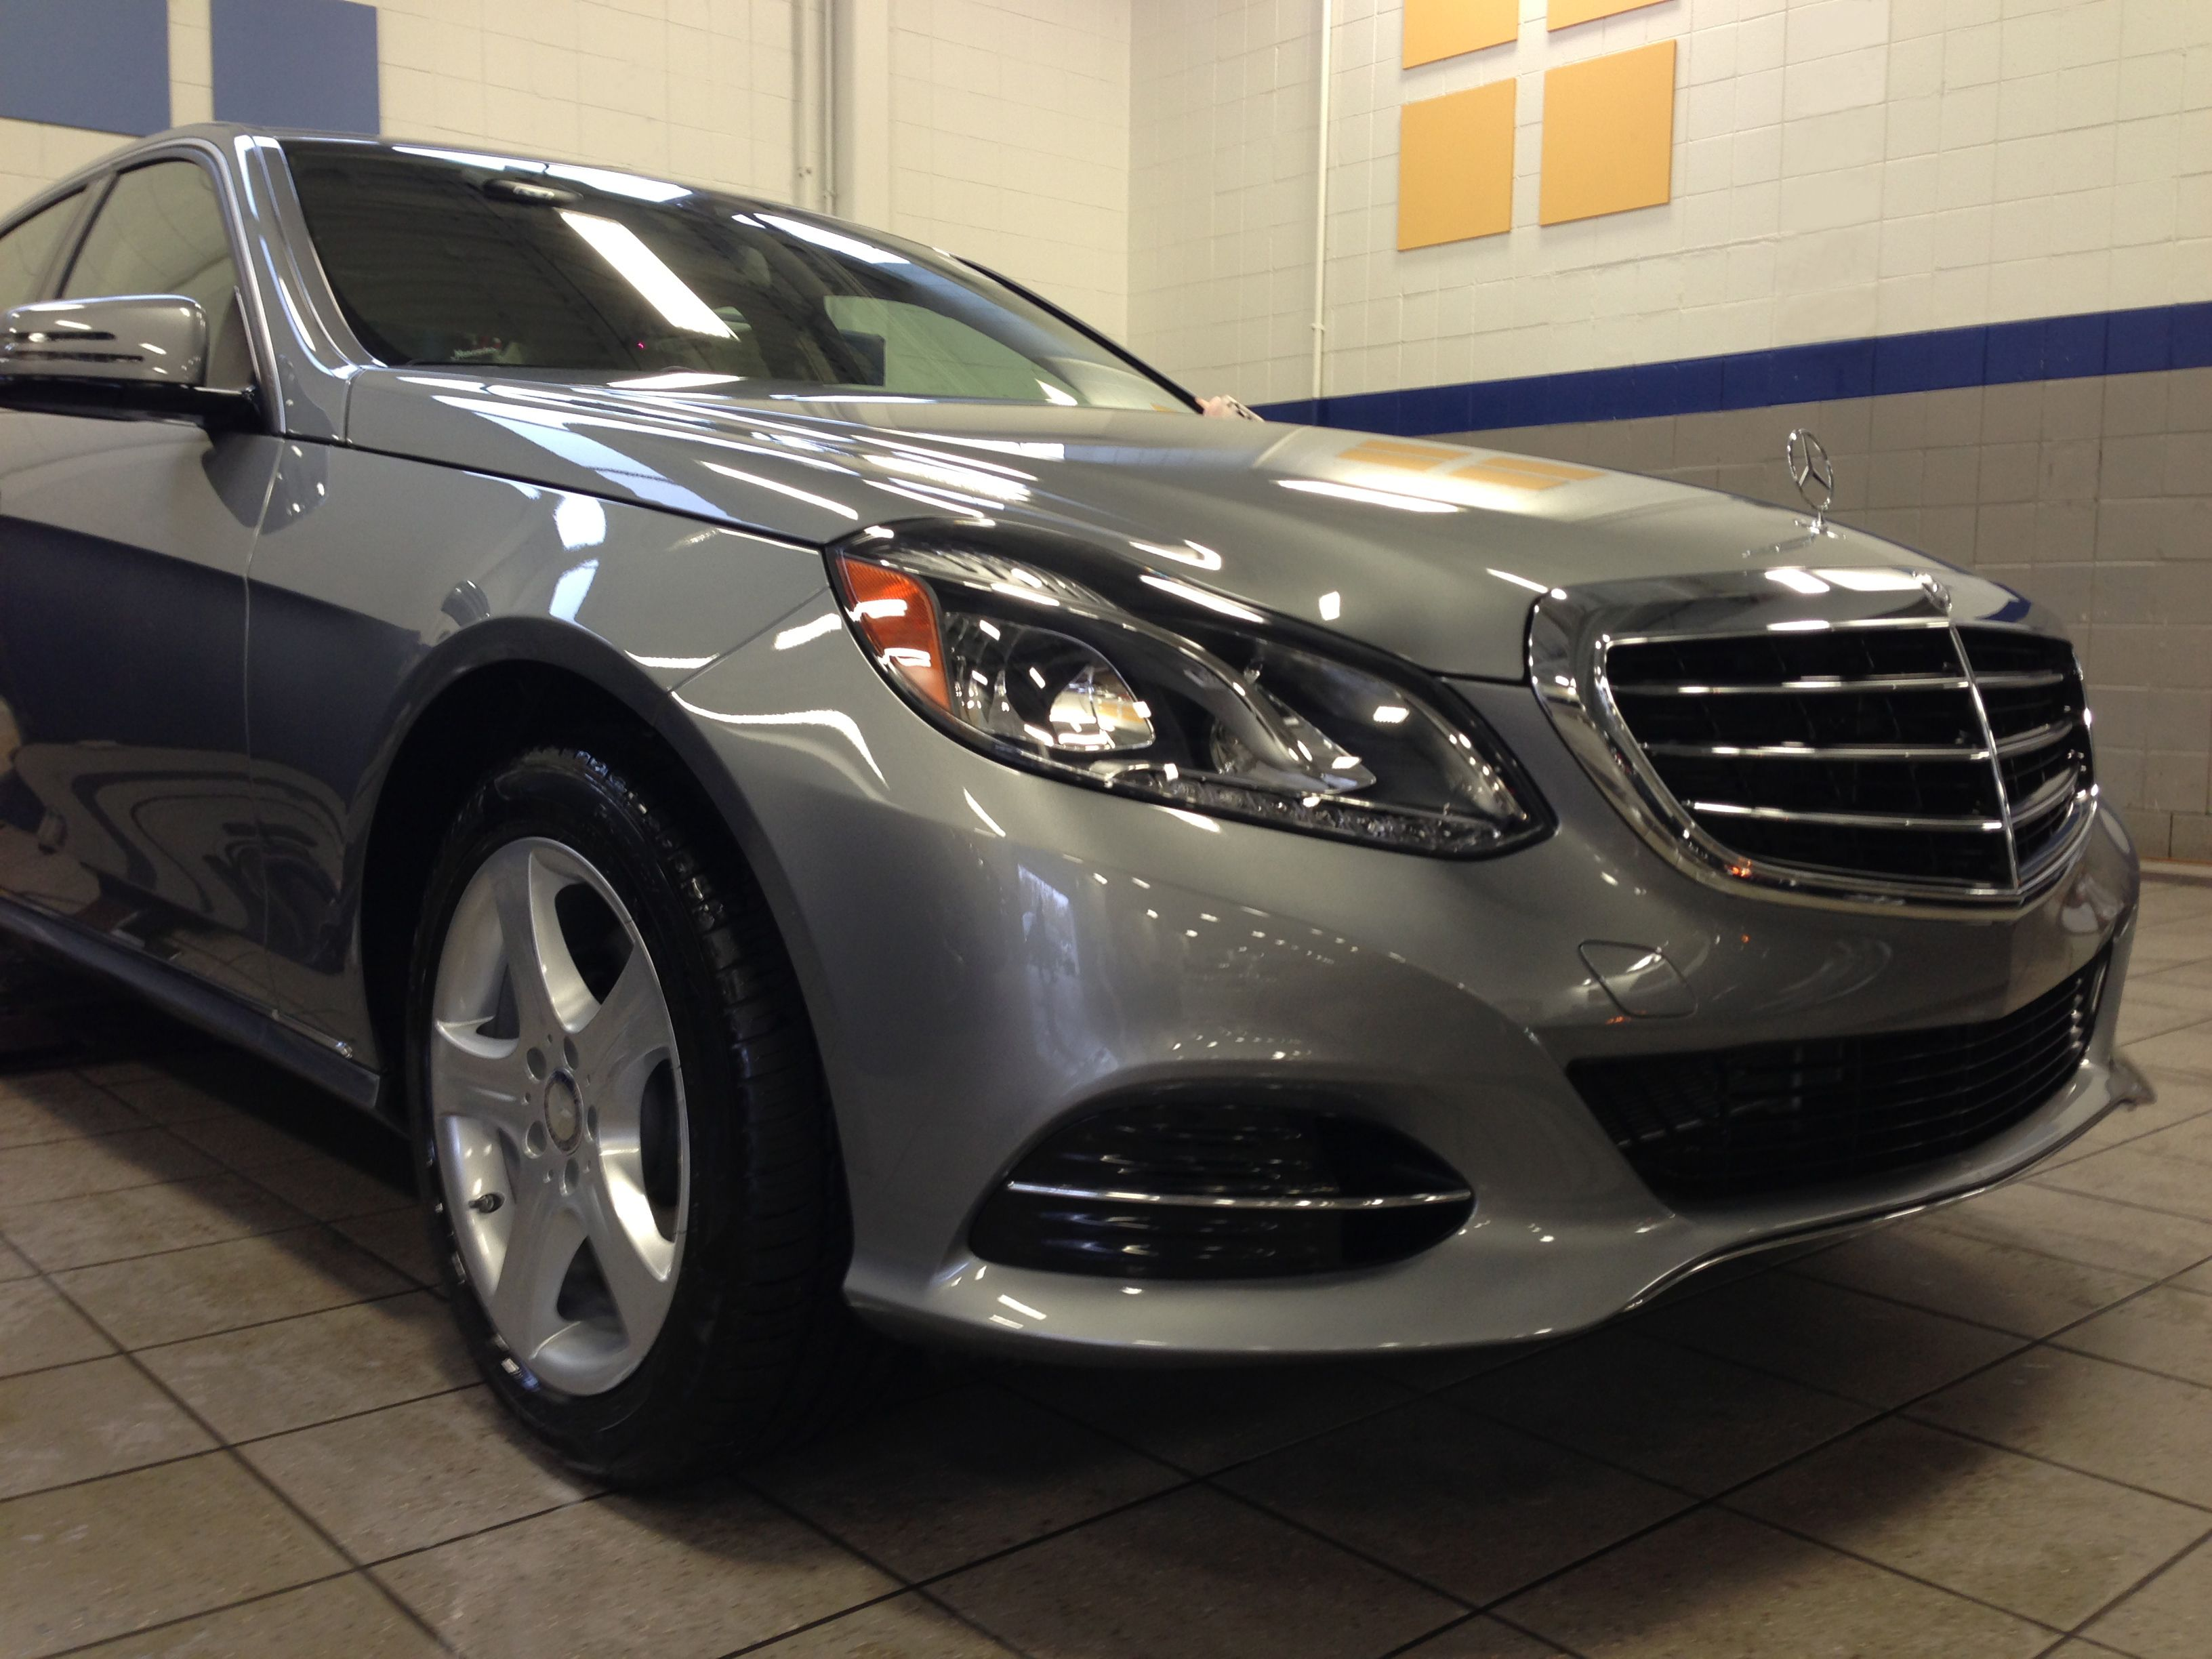 2014 mercedes benz e class luxury sedan 2014 mercedes for Mercedes benz luxury